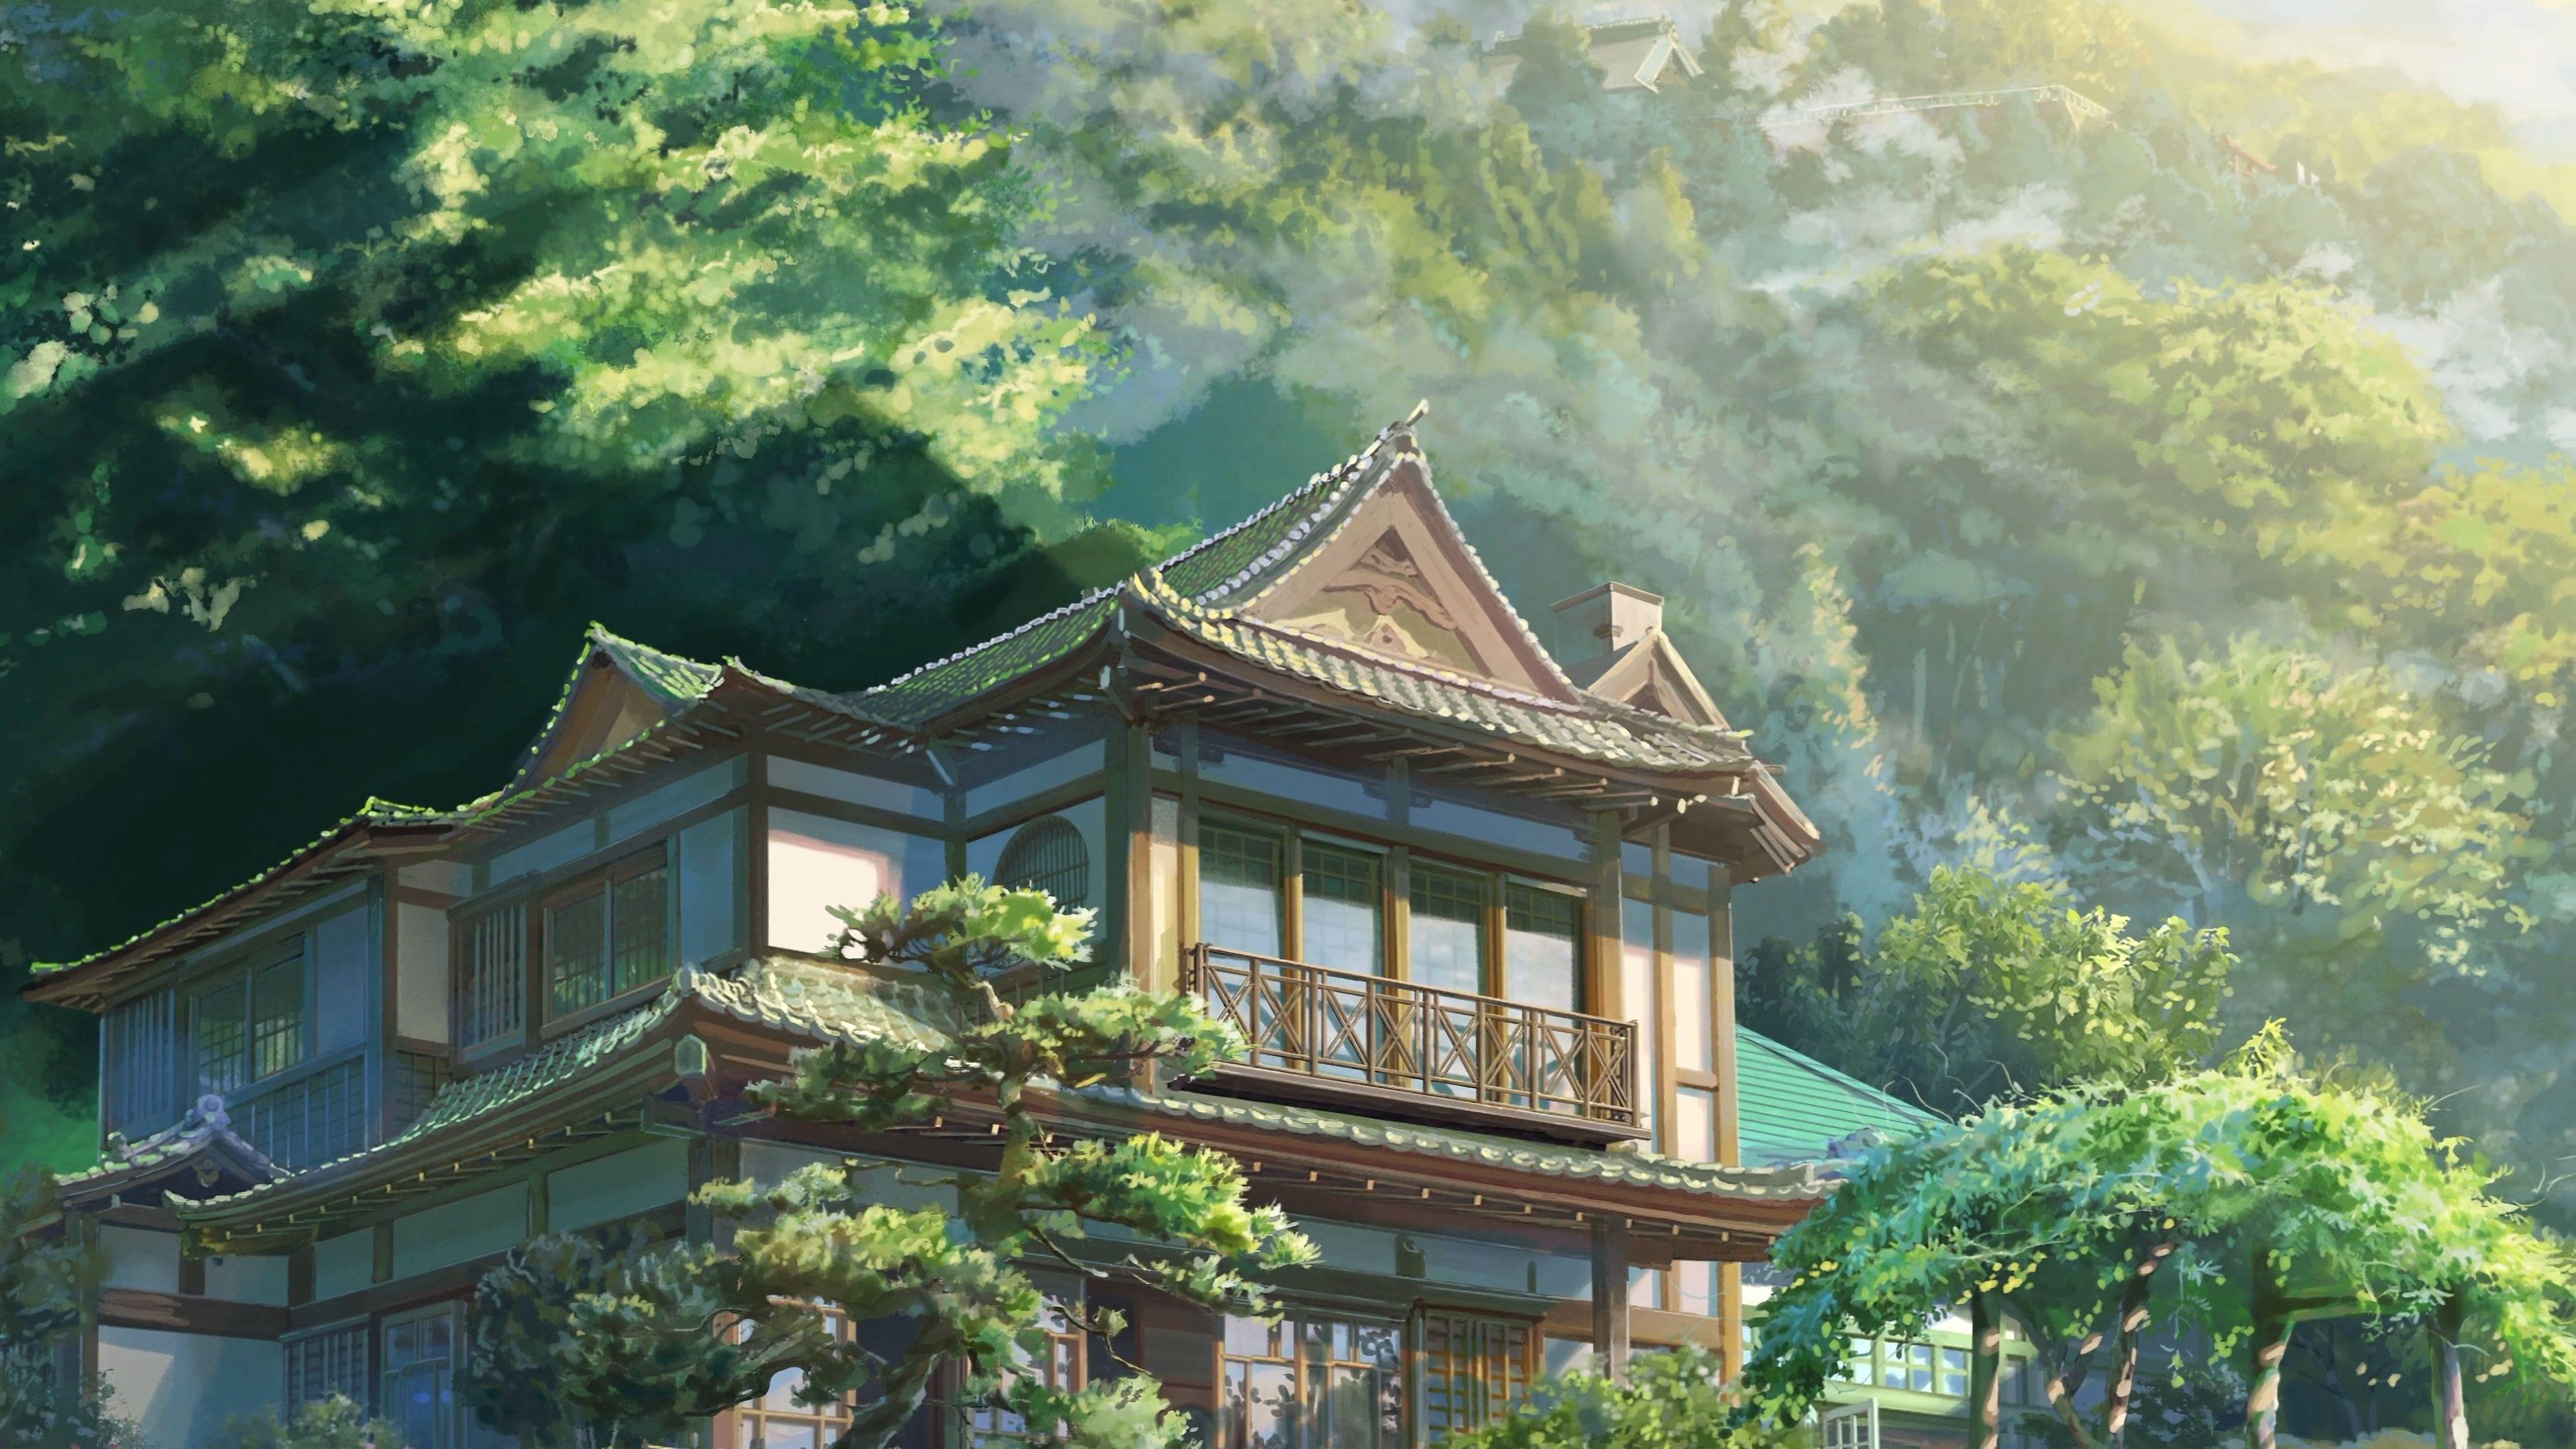 It was so beautiful that i decided to take … Makoto Shinkai Kimi no Na Wa #4K #wallpaper #hdwallpaper # ...